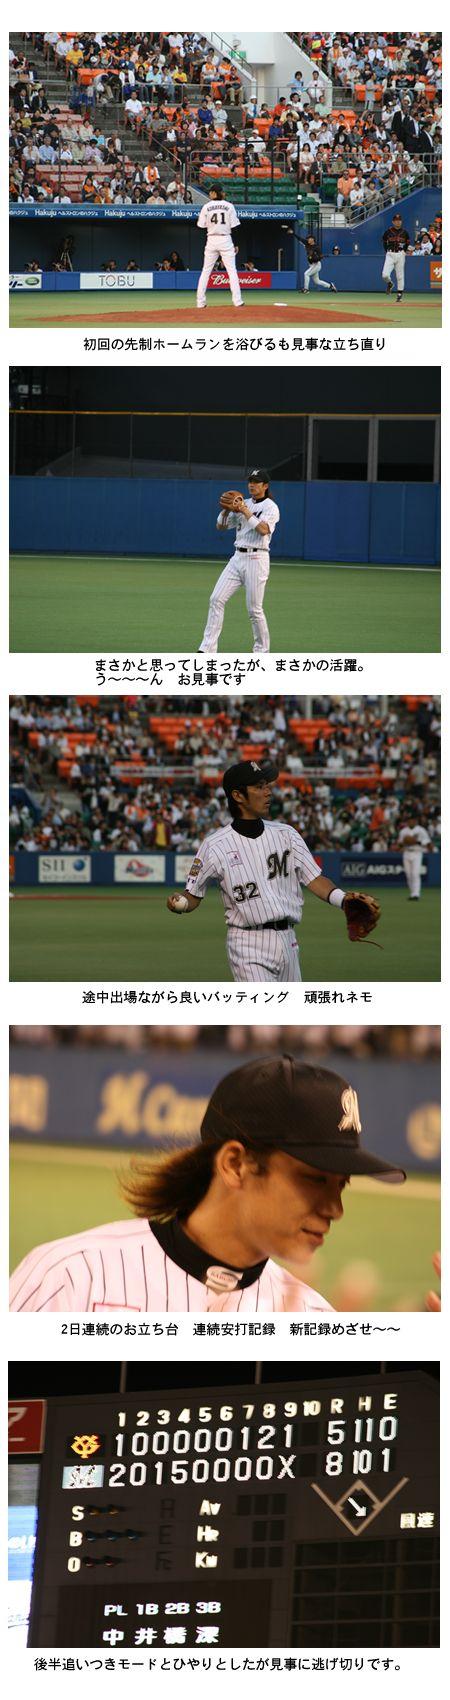 07-06-06-giants.jpg